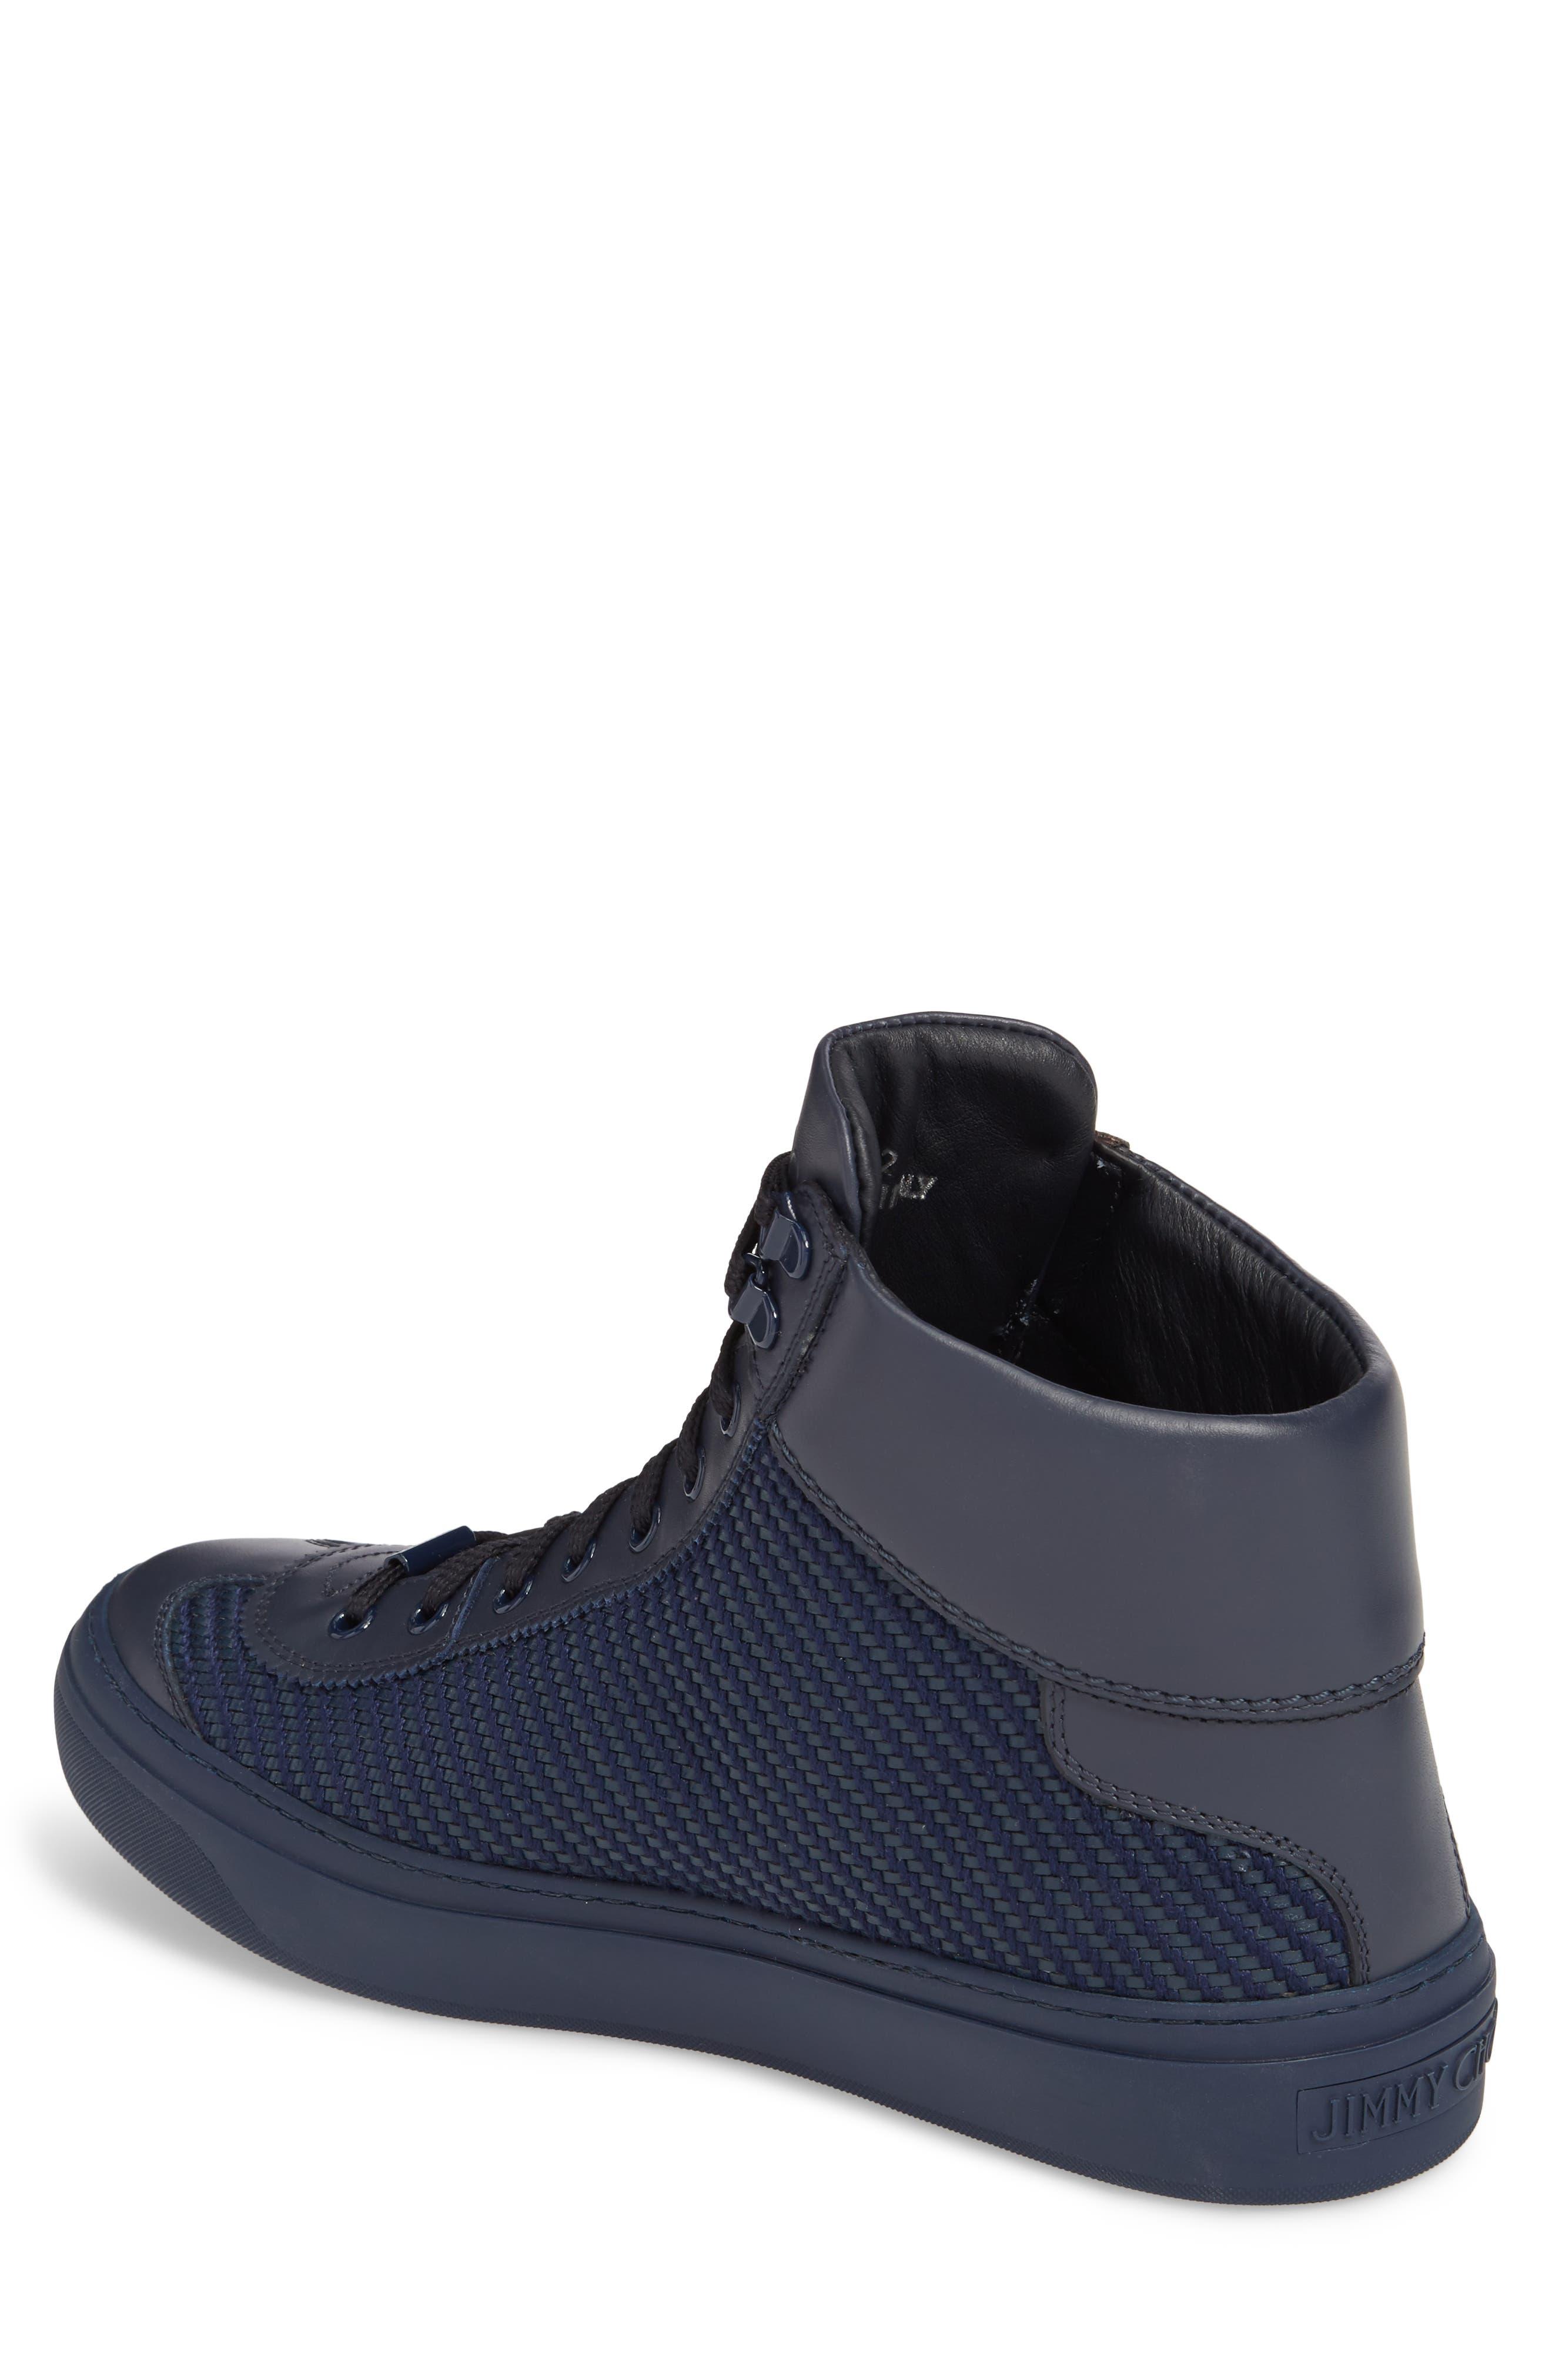 Argyle Sneaker,                             Alternate thumbnail 2, color,                             Navy